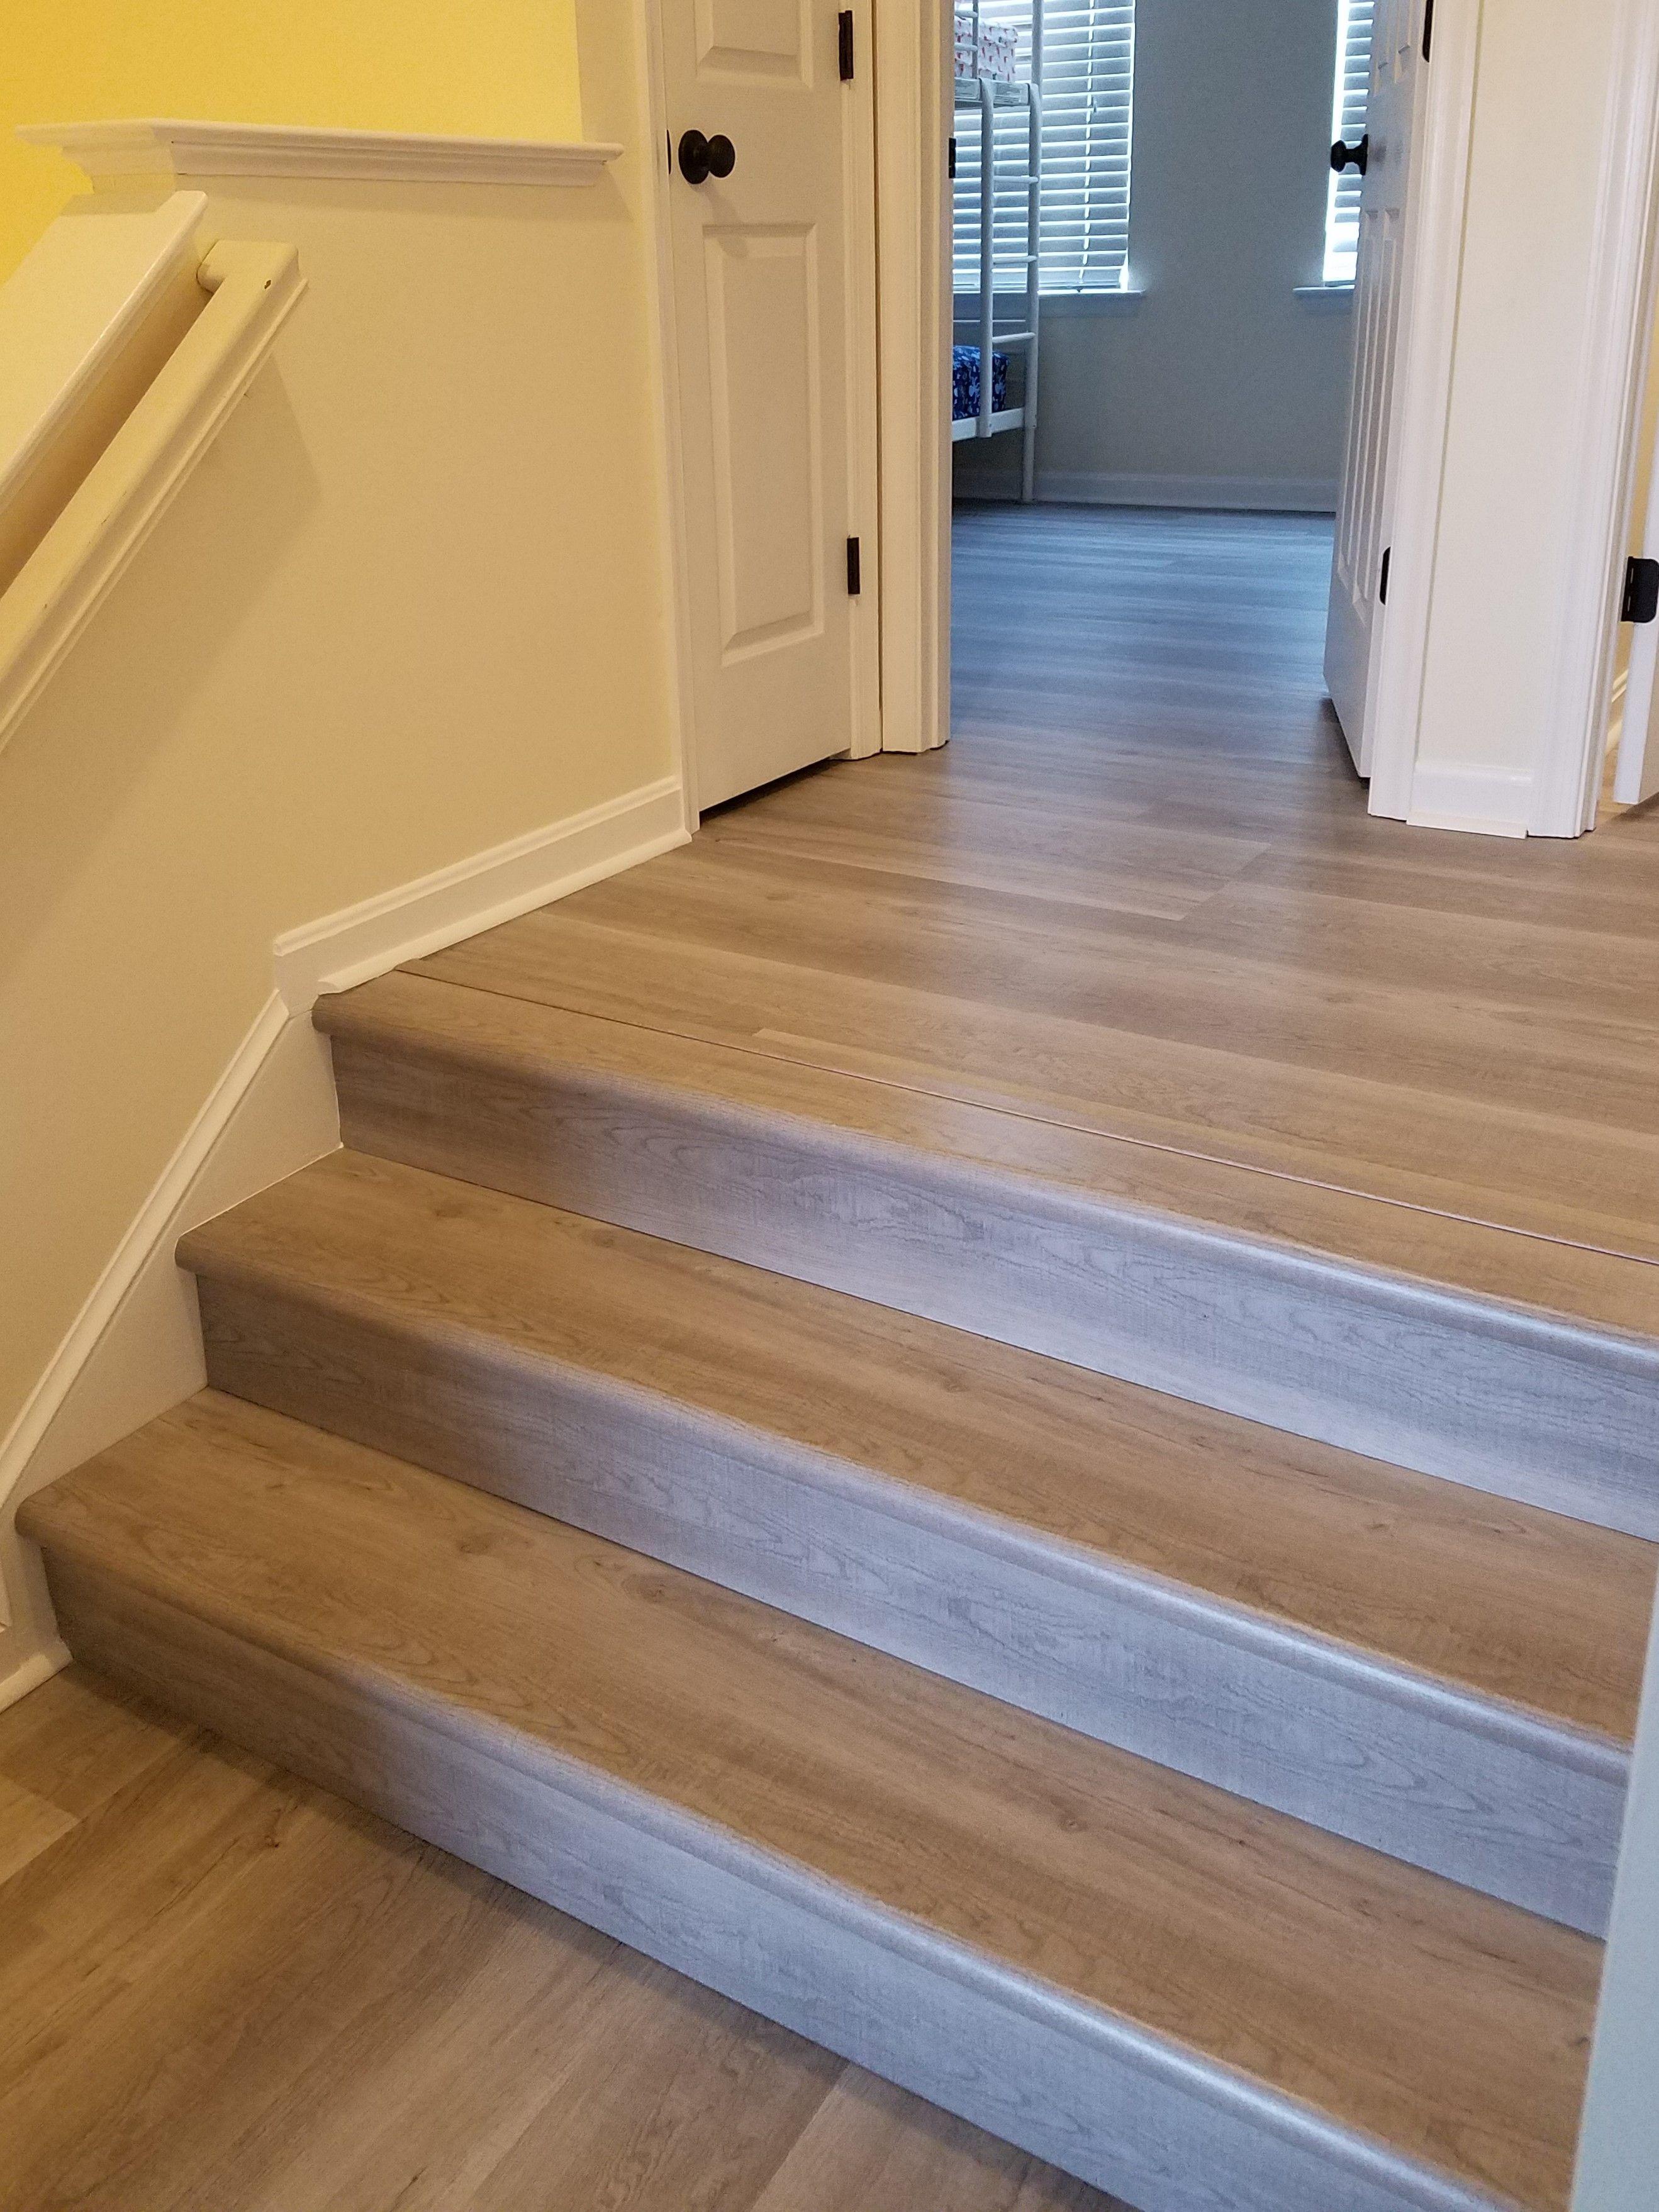 1500 lbs of Coastal Oak Vinyl Plank flooring. Installed by